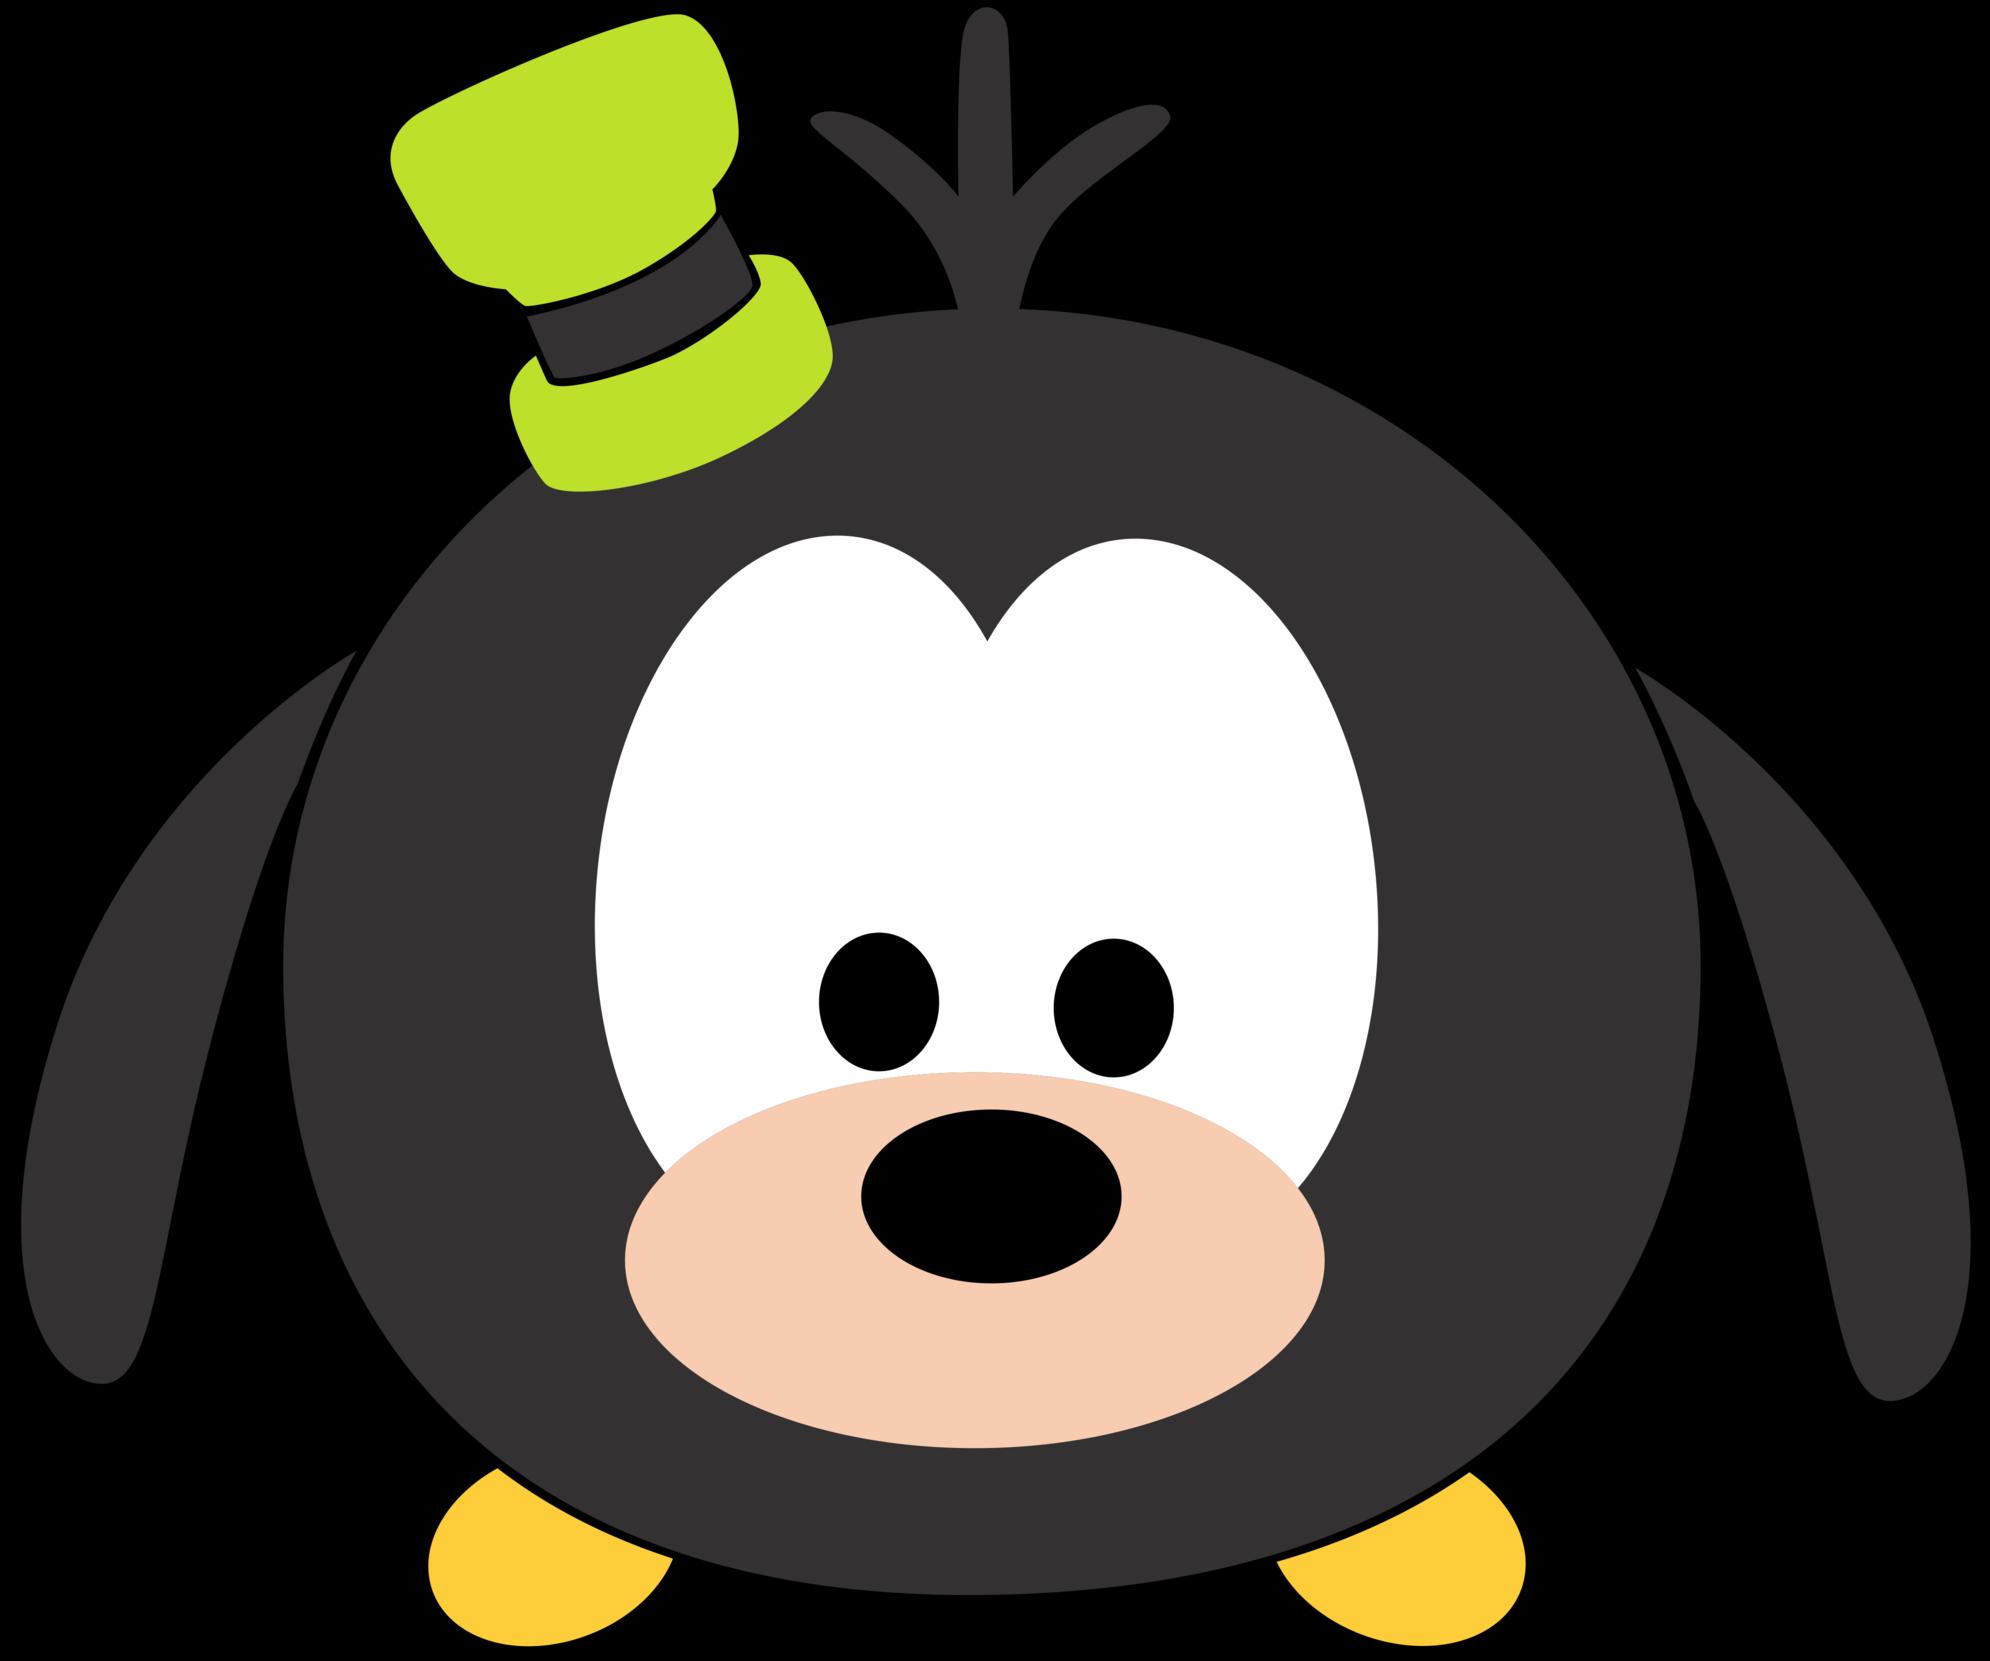 Disney star clipart image royalty free download Disney Tsum Tsum Clipart 6 image royalty free download